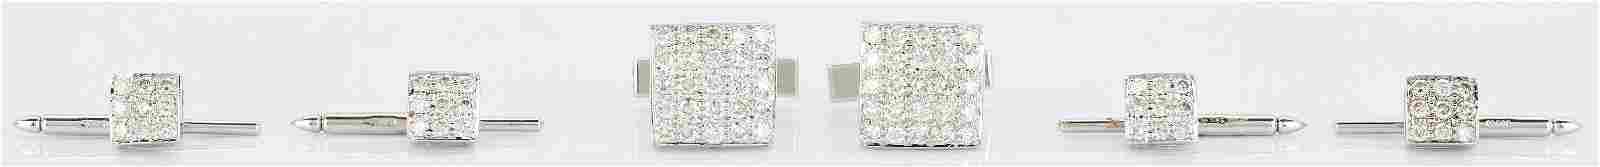 14K Gold and Diamond Tuxedo Set